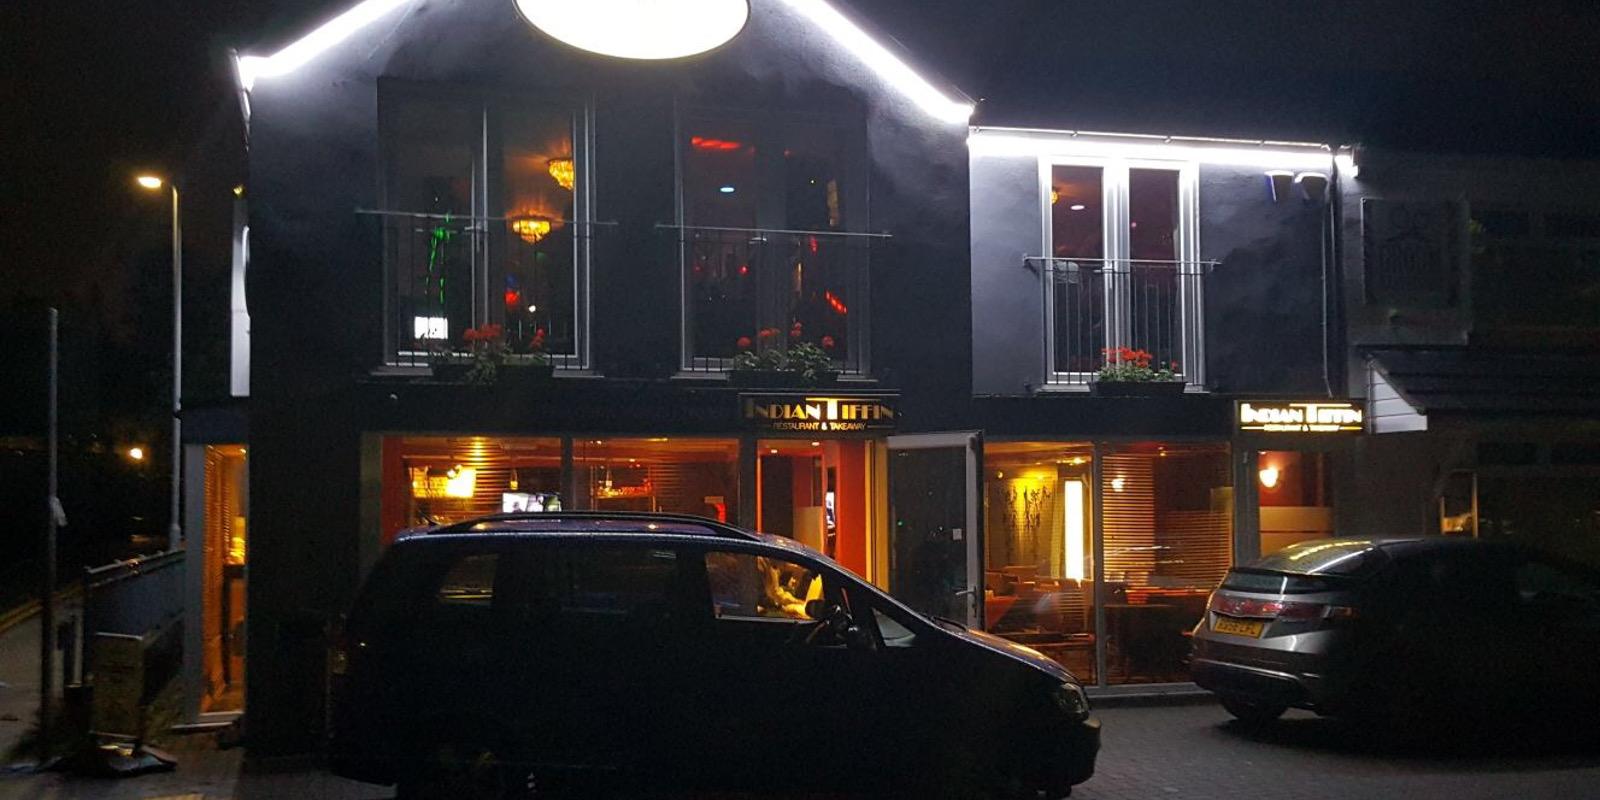 Steakhouse Near London Bridge